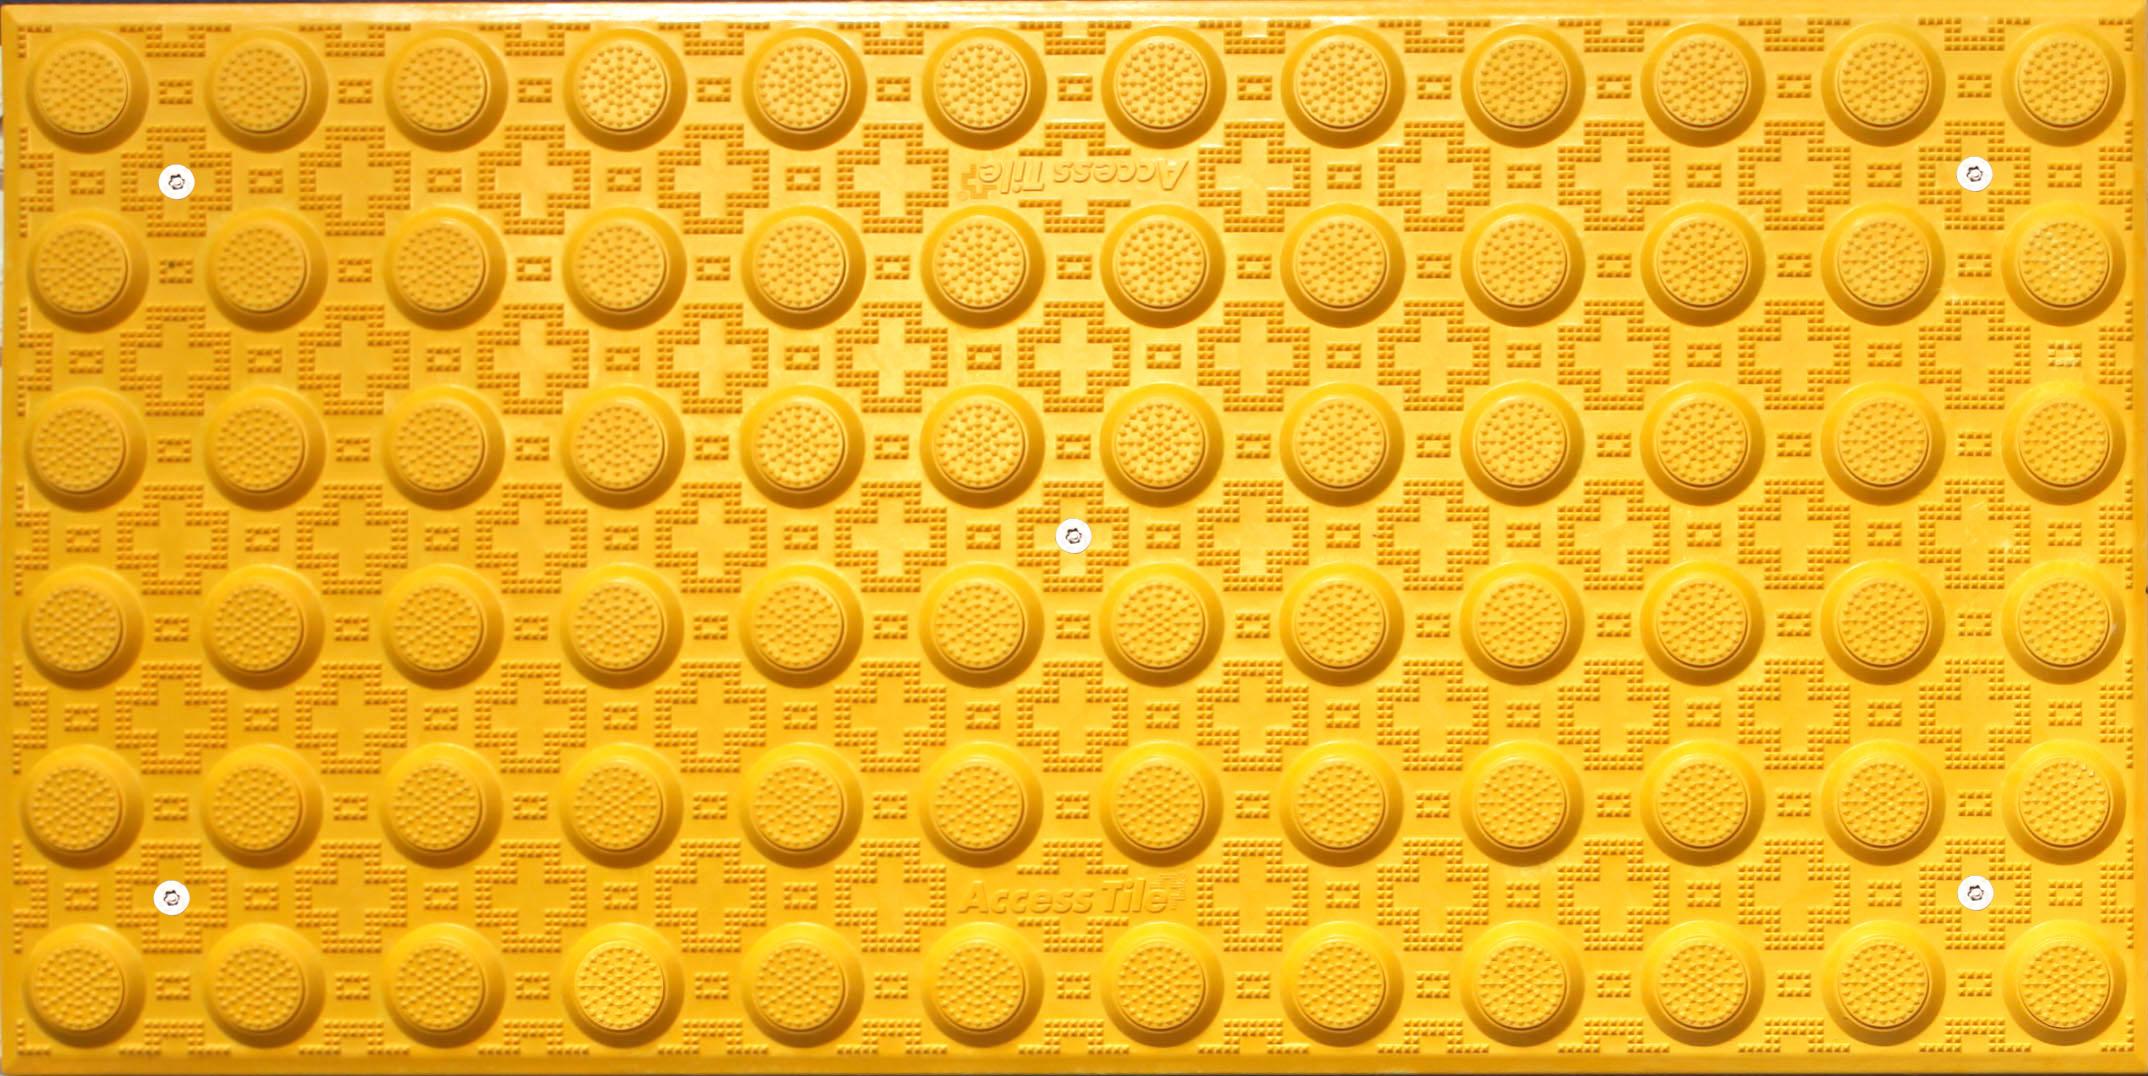 CIP Hazard Yellow 300x600 1